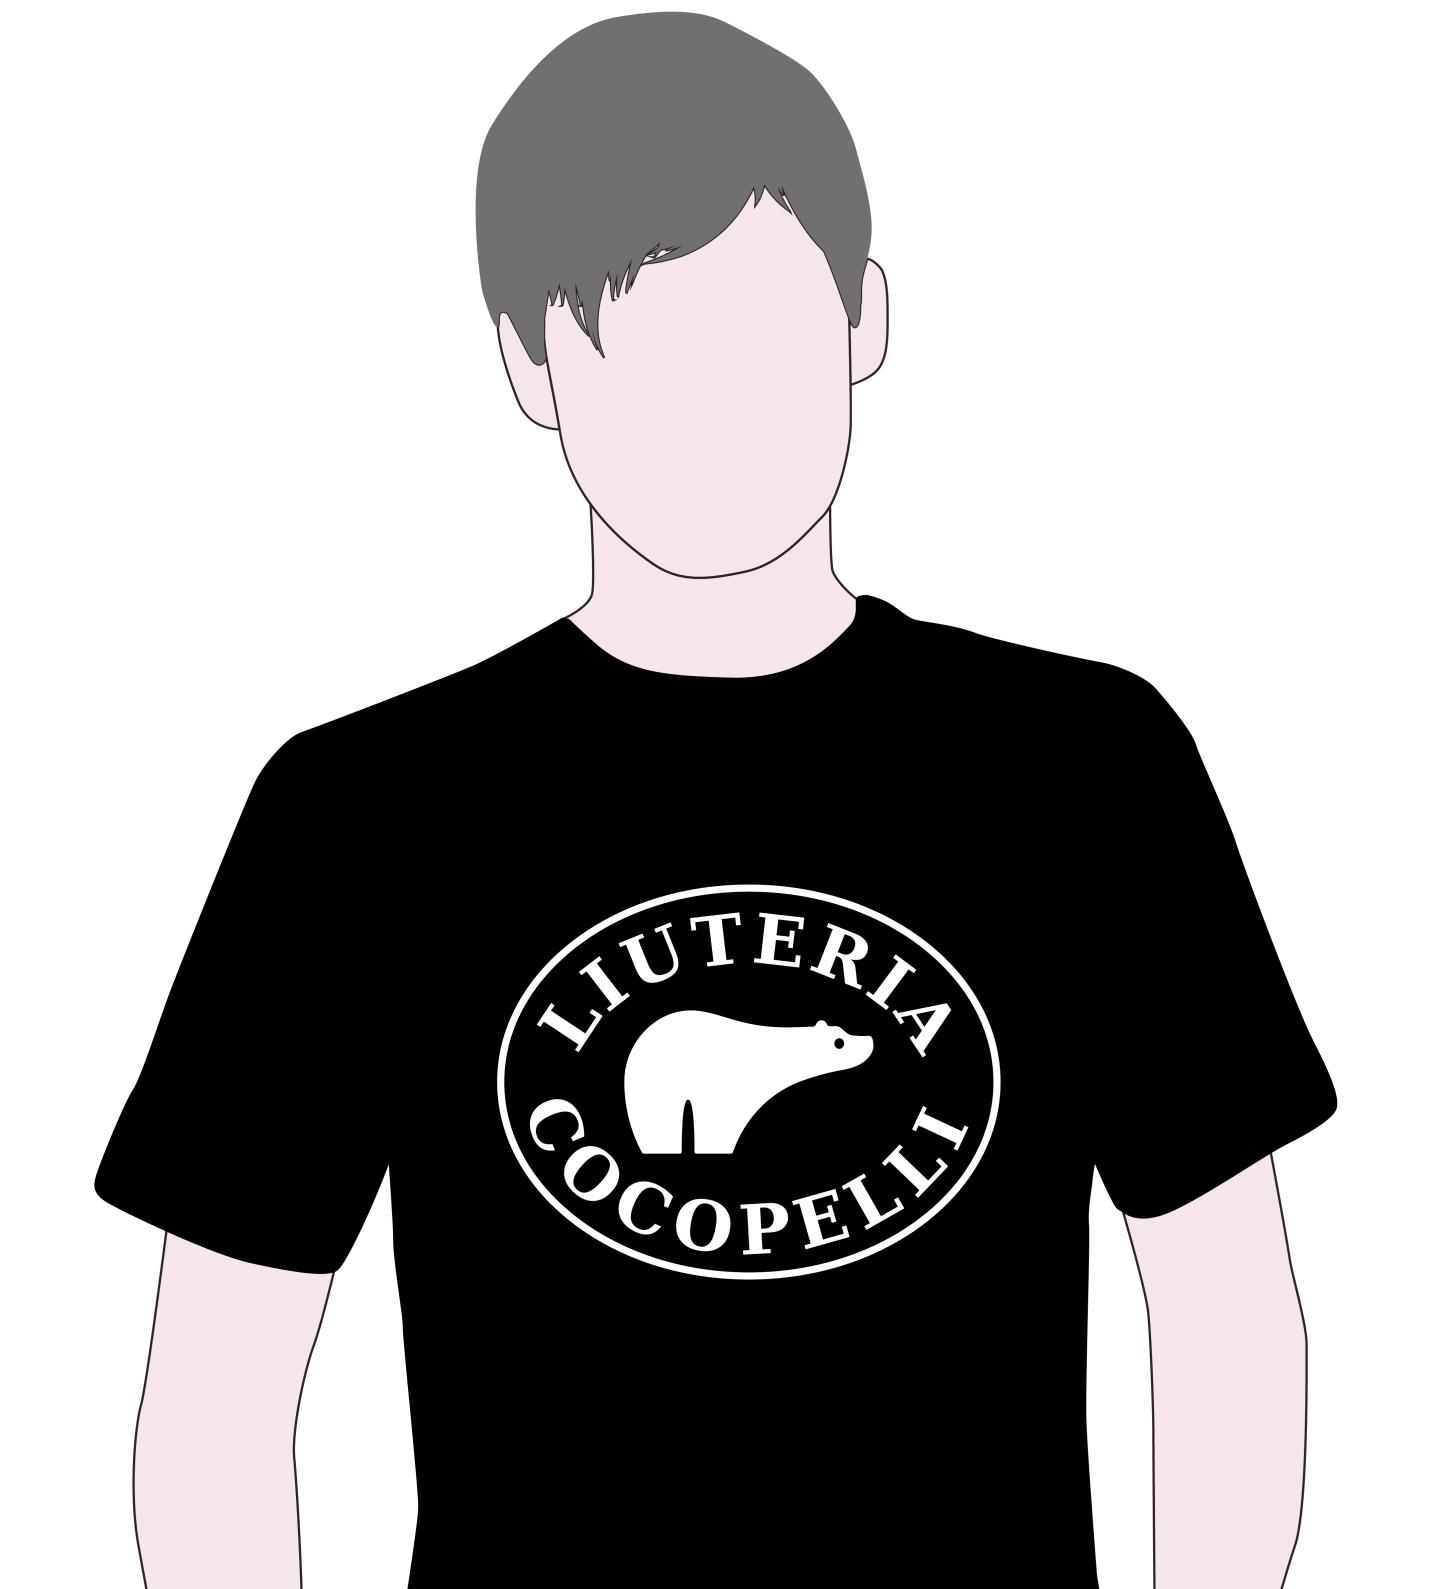 t-shirt-liuteria-cocopelli